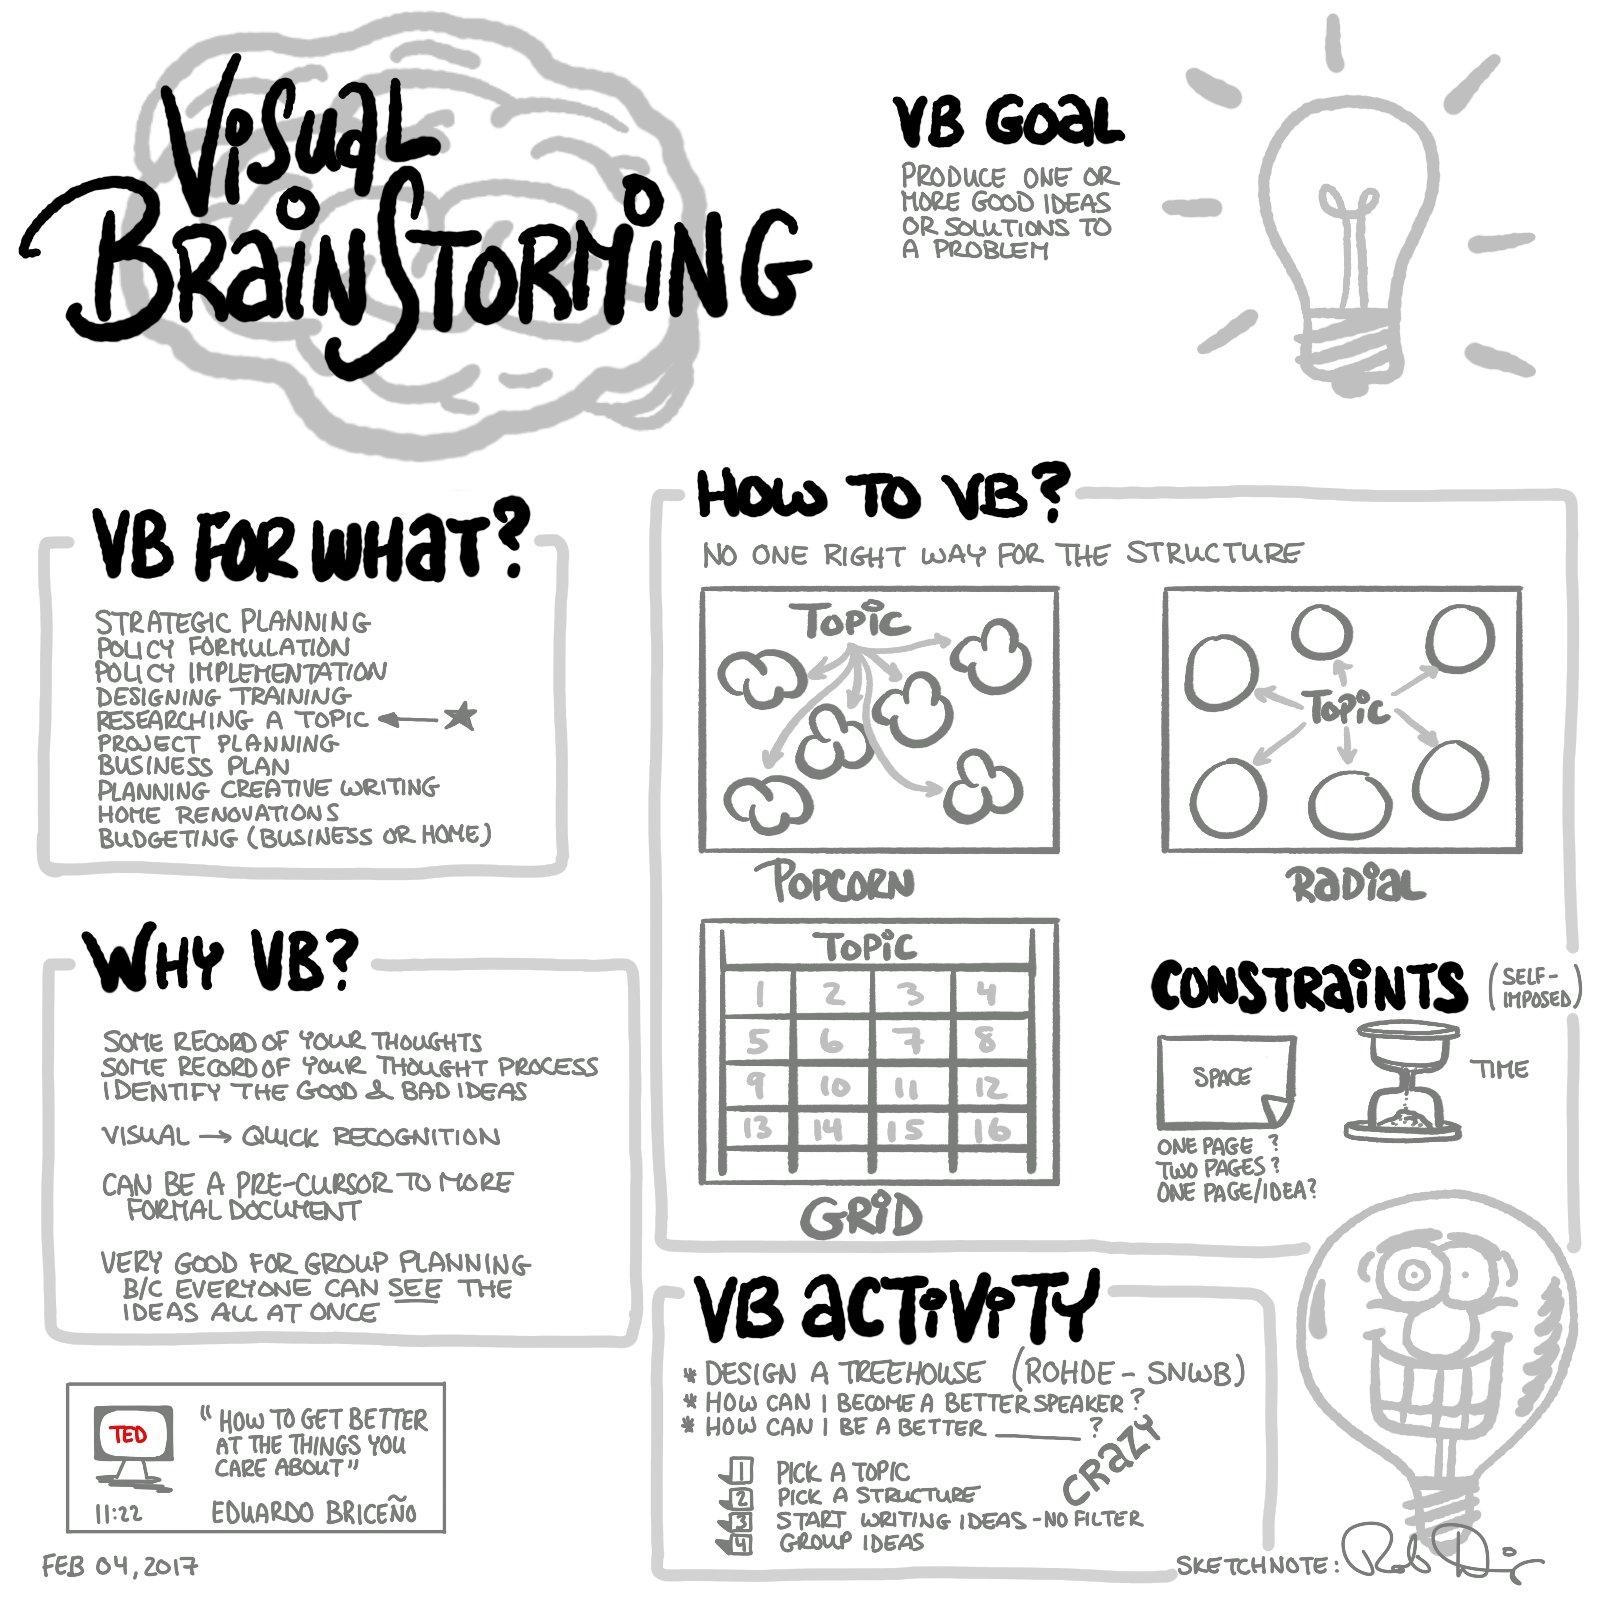 Visual Brainstorming